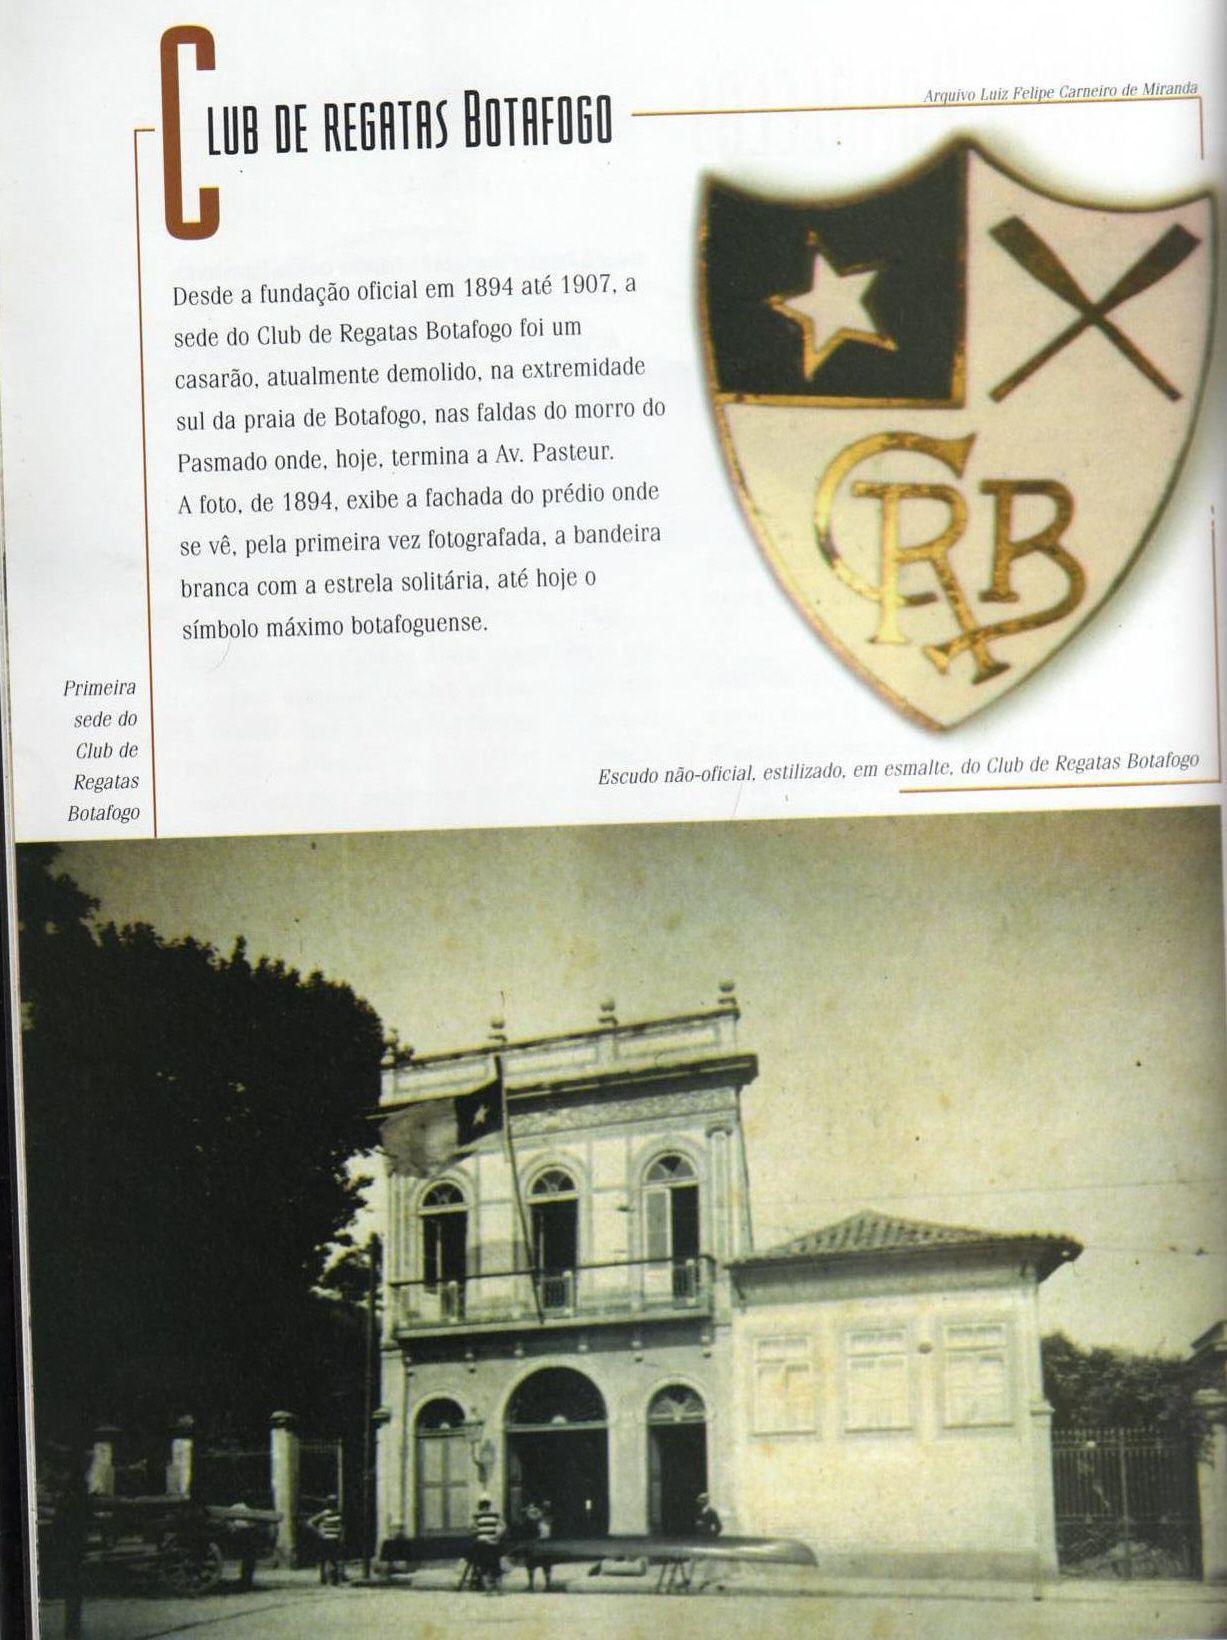 Botafogo (Regatas)